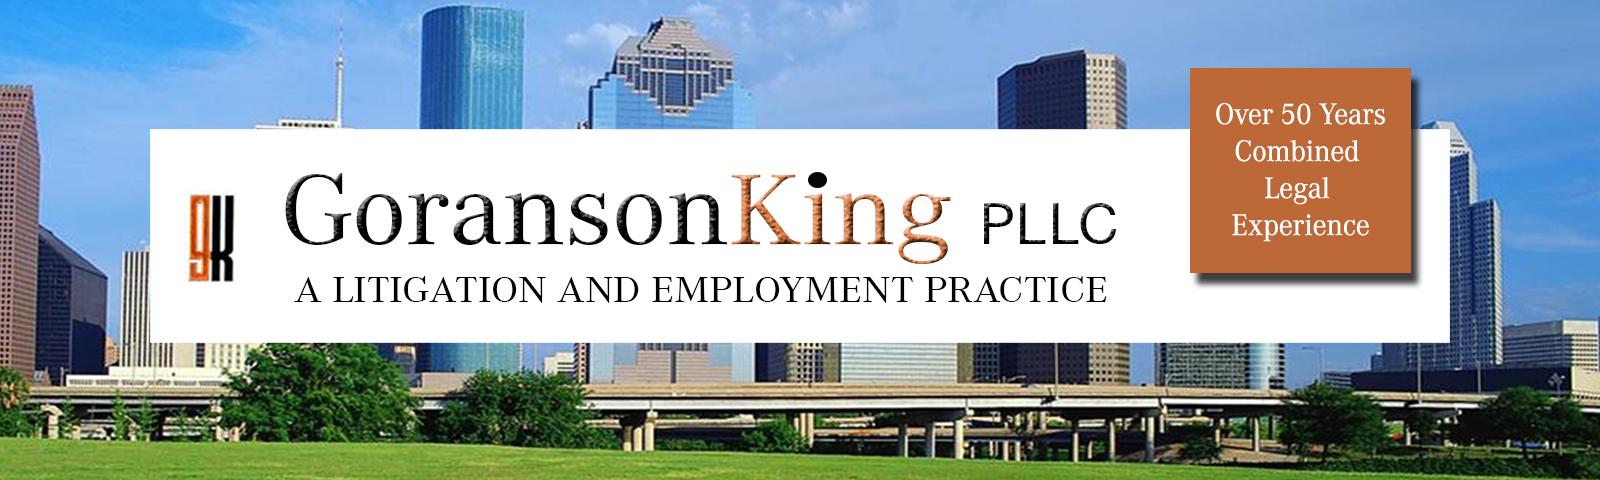 Goranson King PLLC